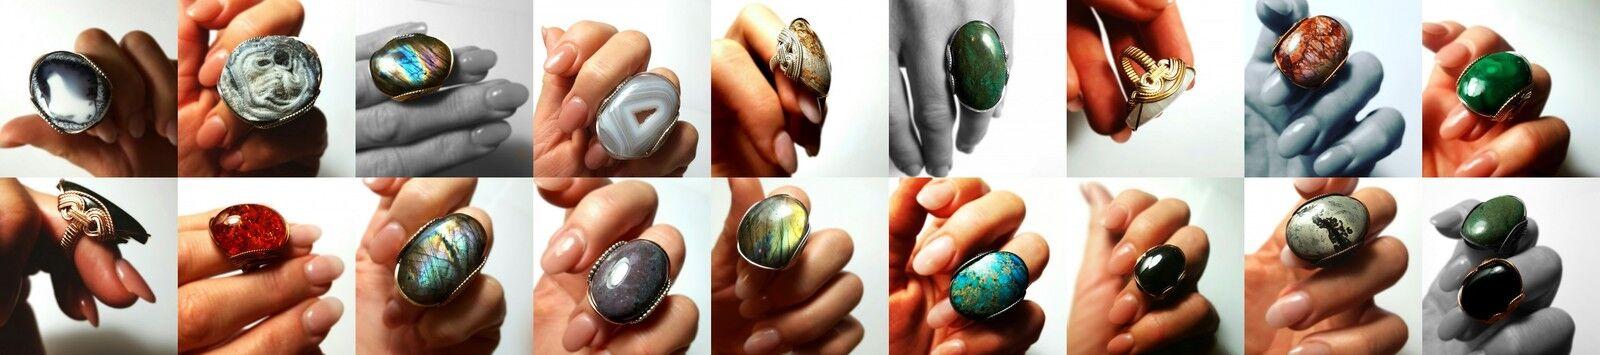 Finger Candy Rings